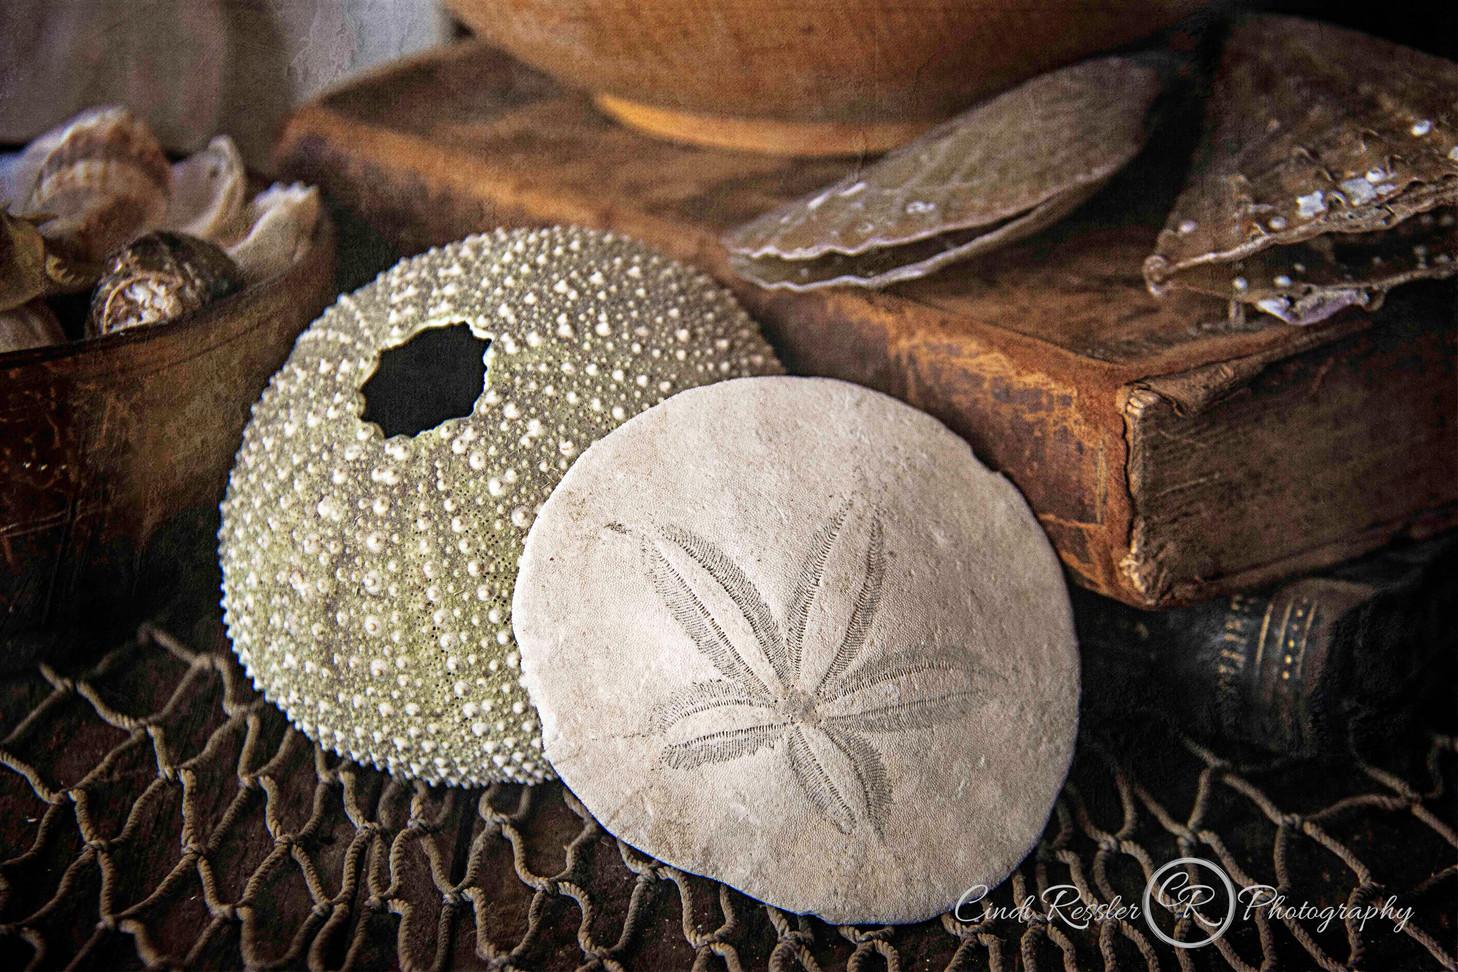 The Sea Urchin And Sand Dollar